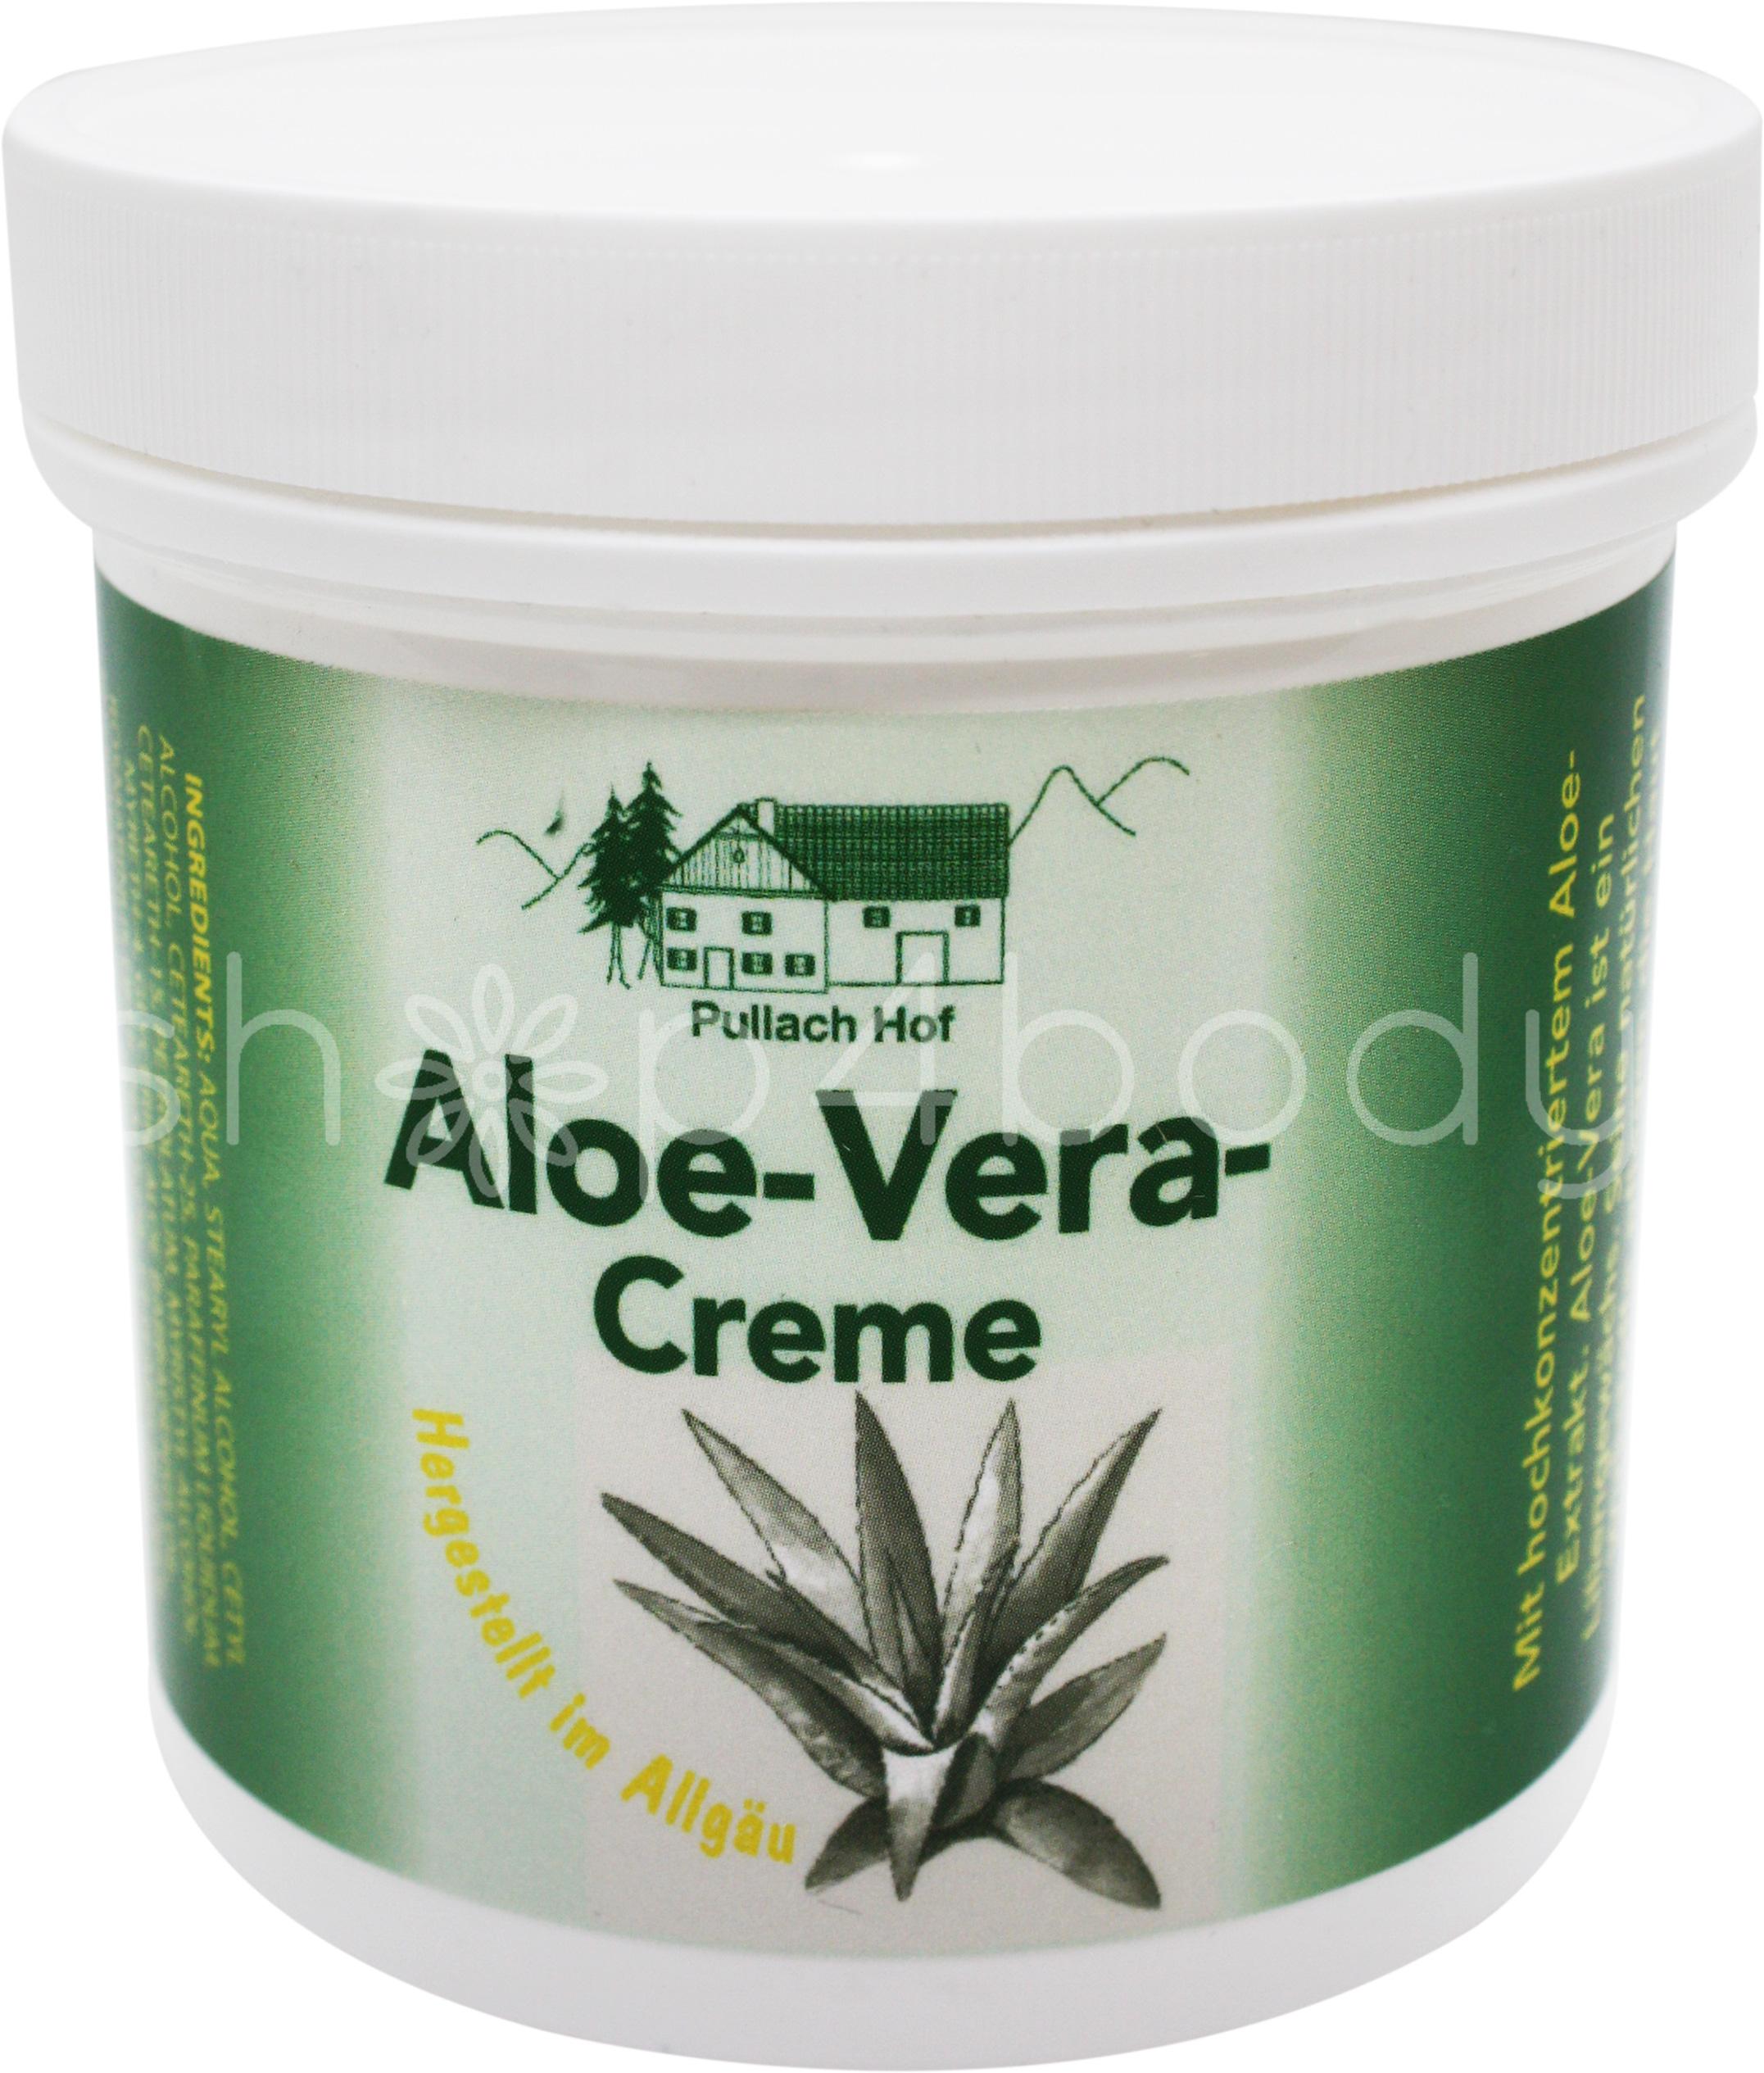 aloe-vera-creme-250-ml-.jpg